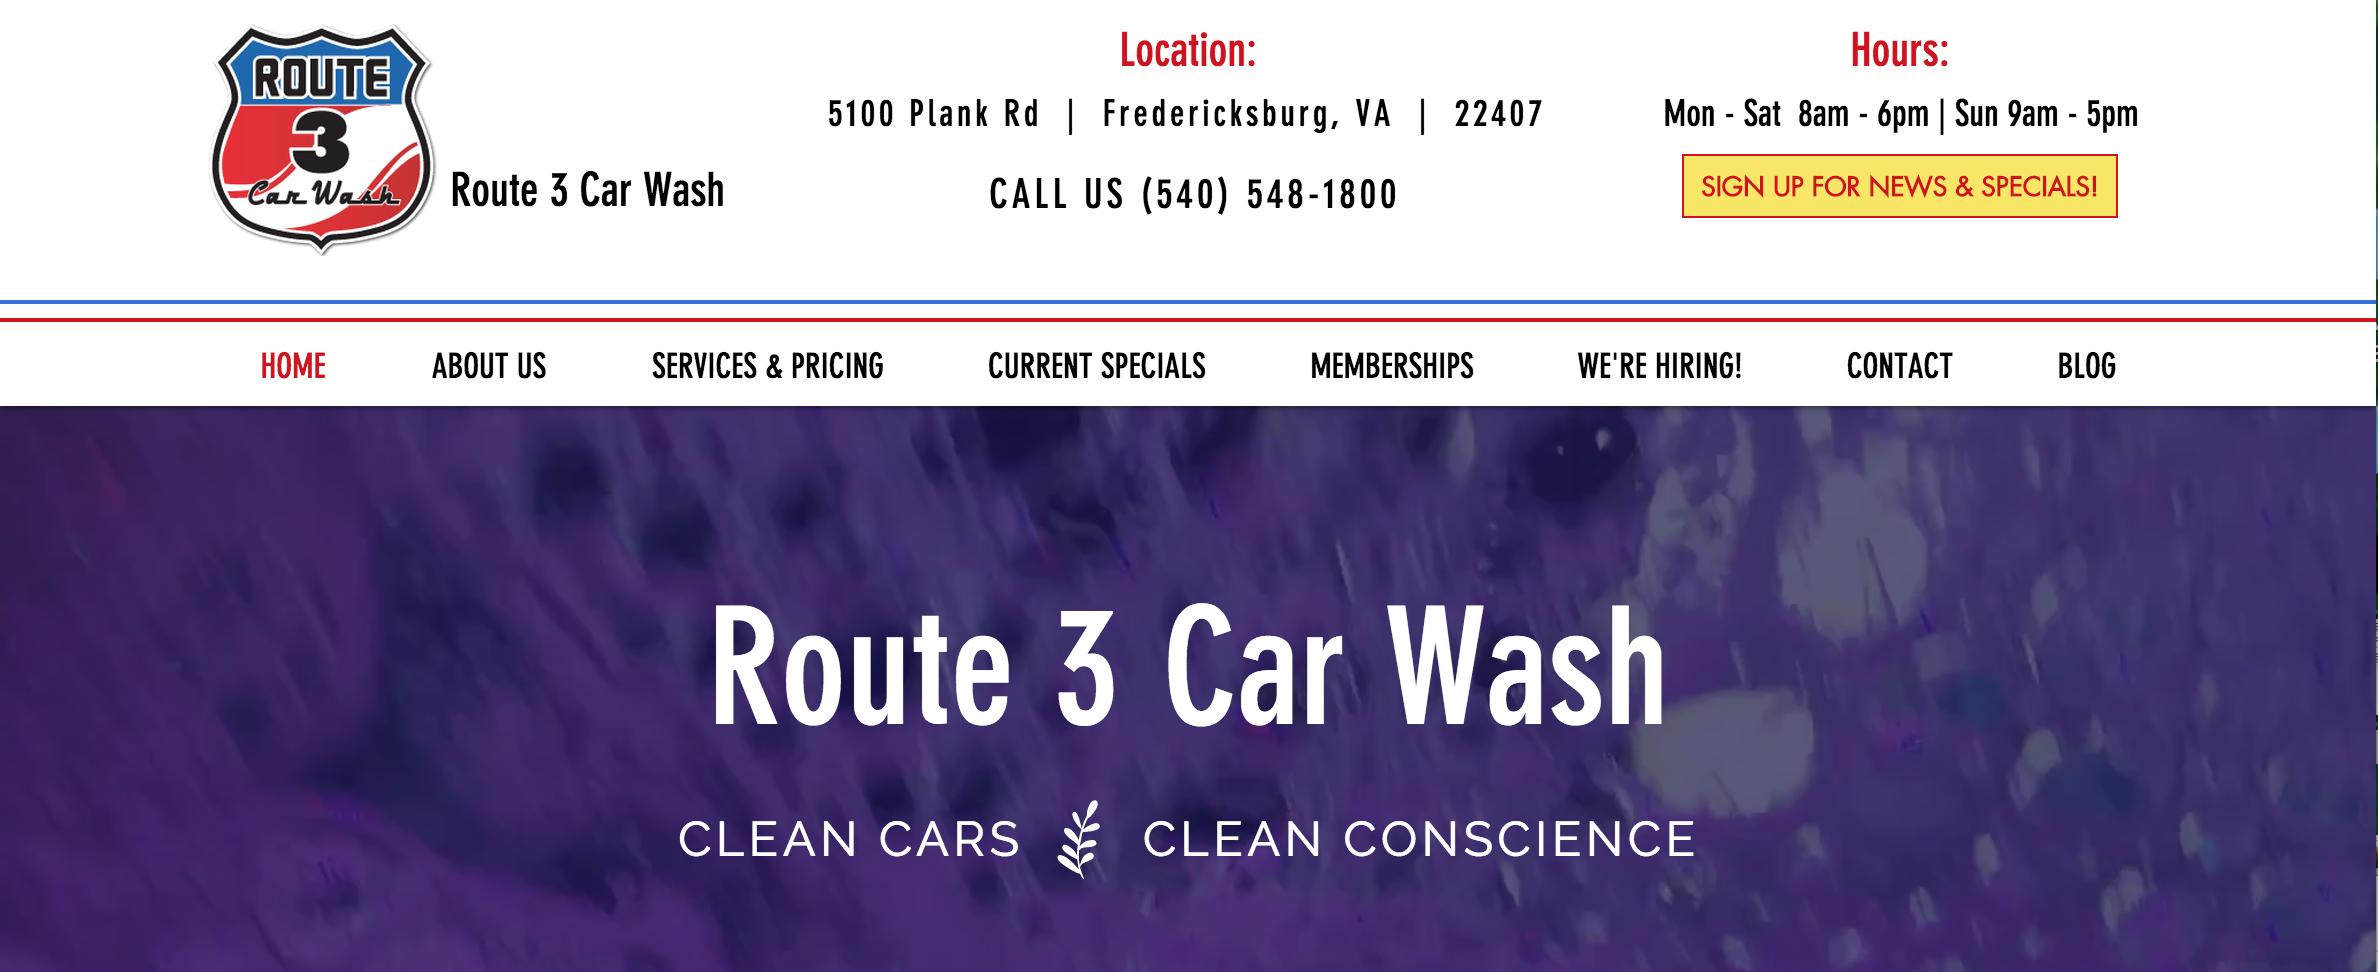 Blog fredericksburg va route 3 car wash solutioingenieria Image collections